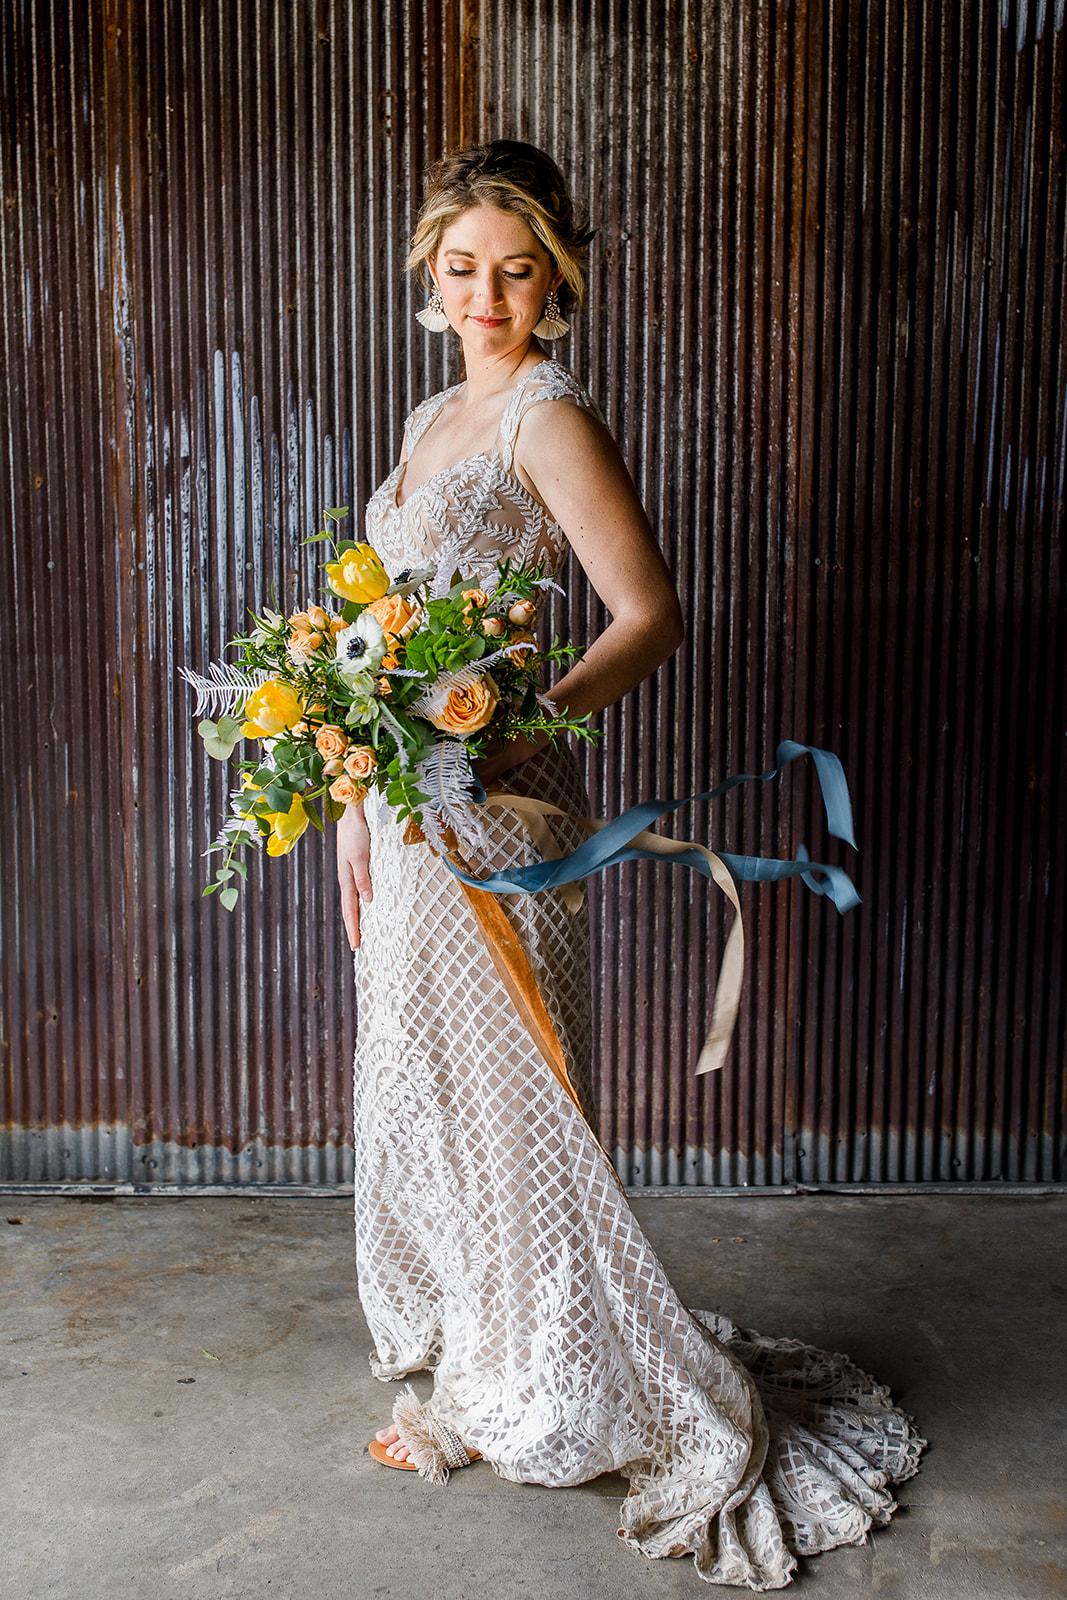 Wedding Bouquet Inspiration: Courtney Davidson Wedding Photography featured on Nashville Bride Guide